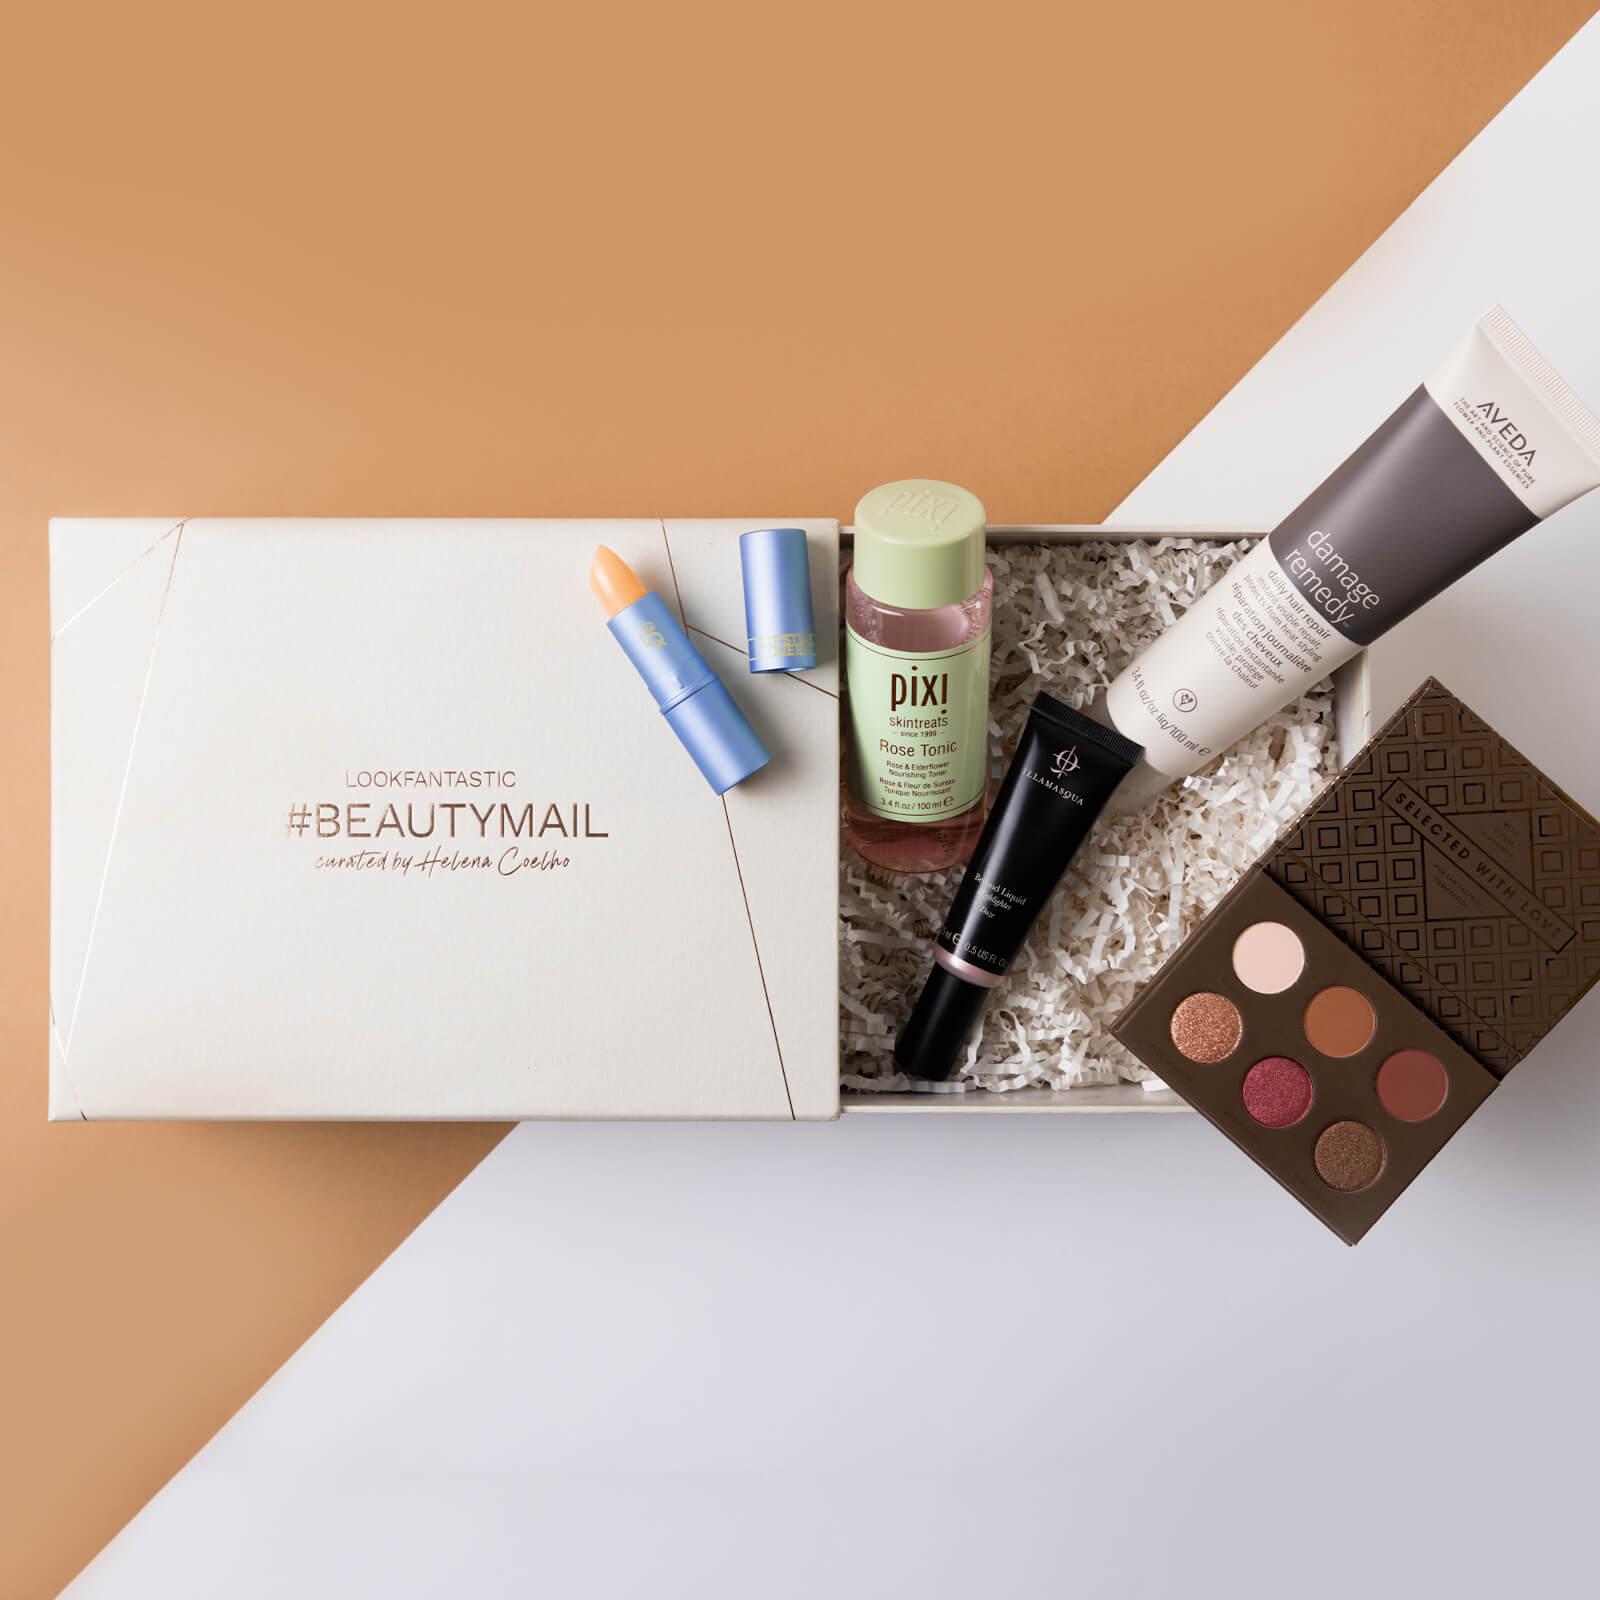 LOOKFANTASTIC #BEAUTYMAIL curated by Helena Coelho Beauty Box (Vale Oltre 130€)